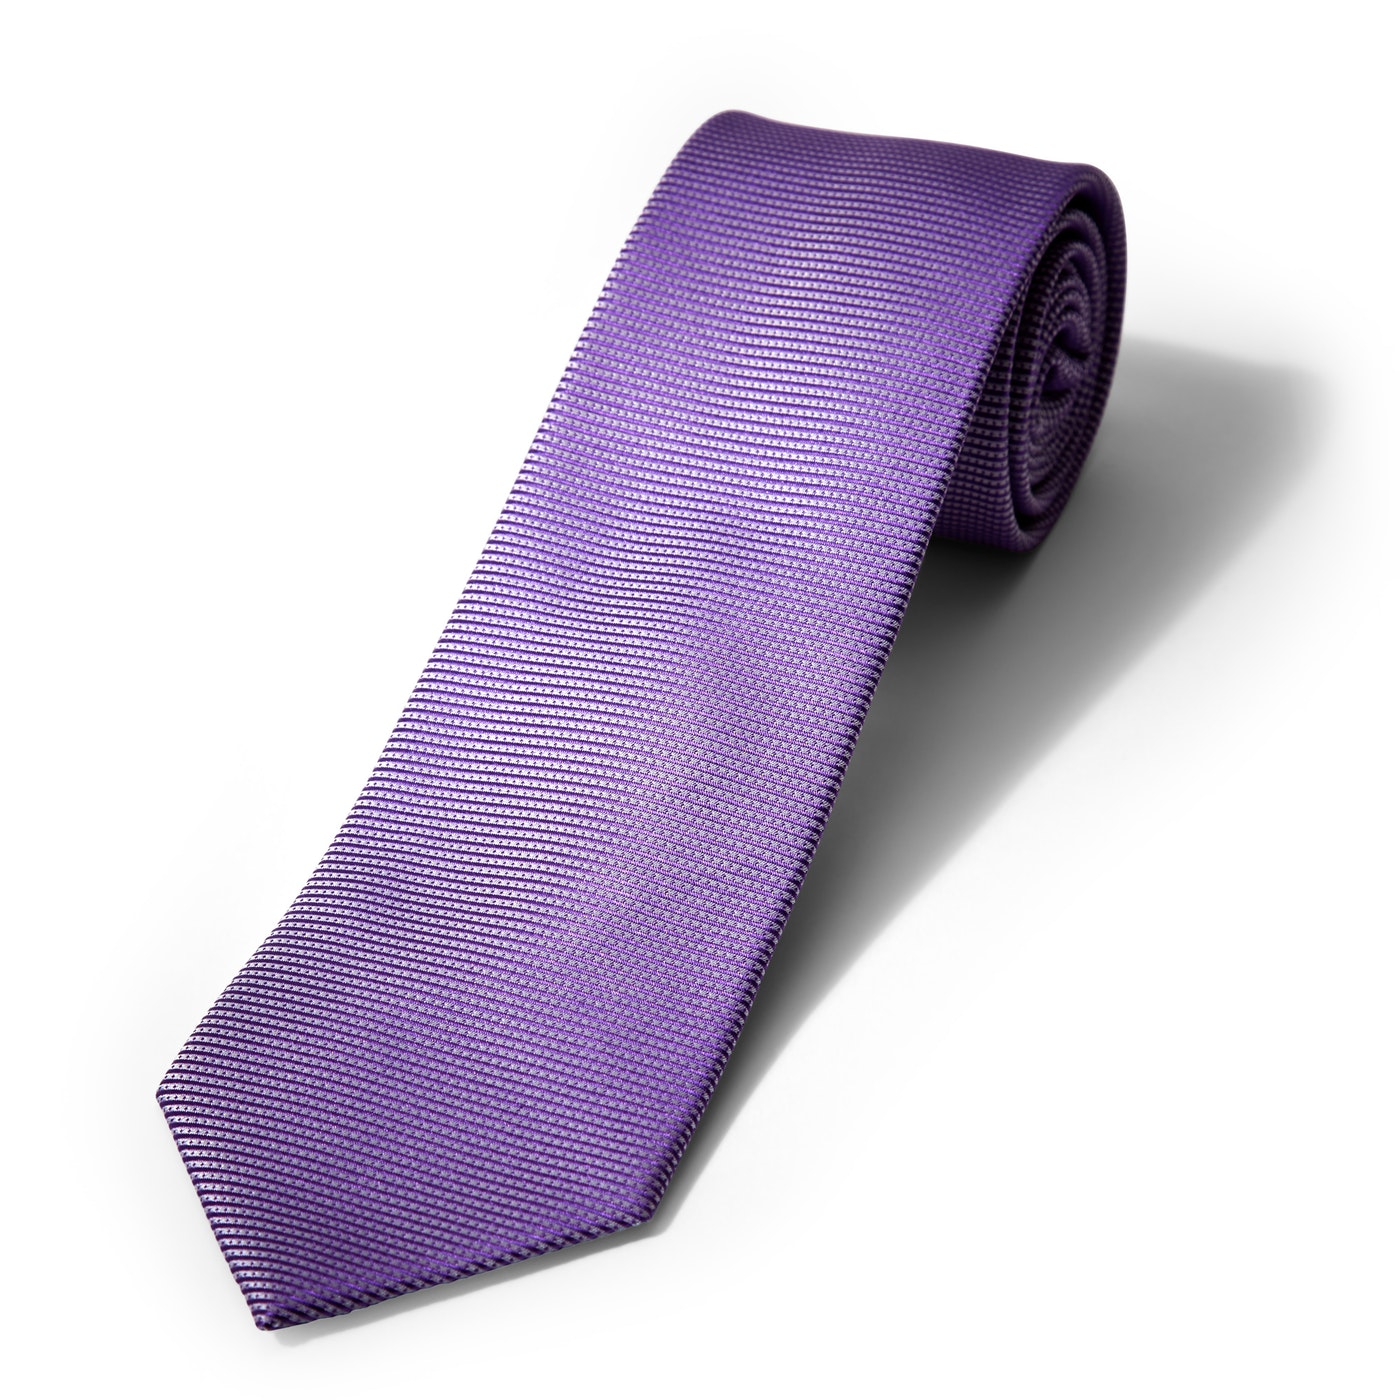 Iridescent Lilac Dobby Tie